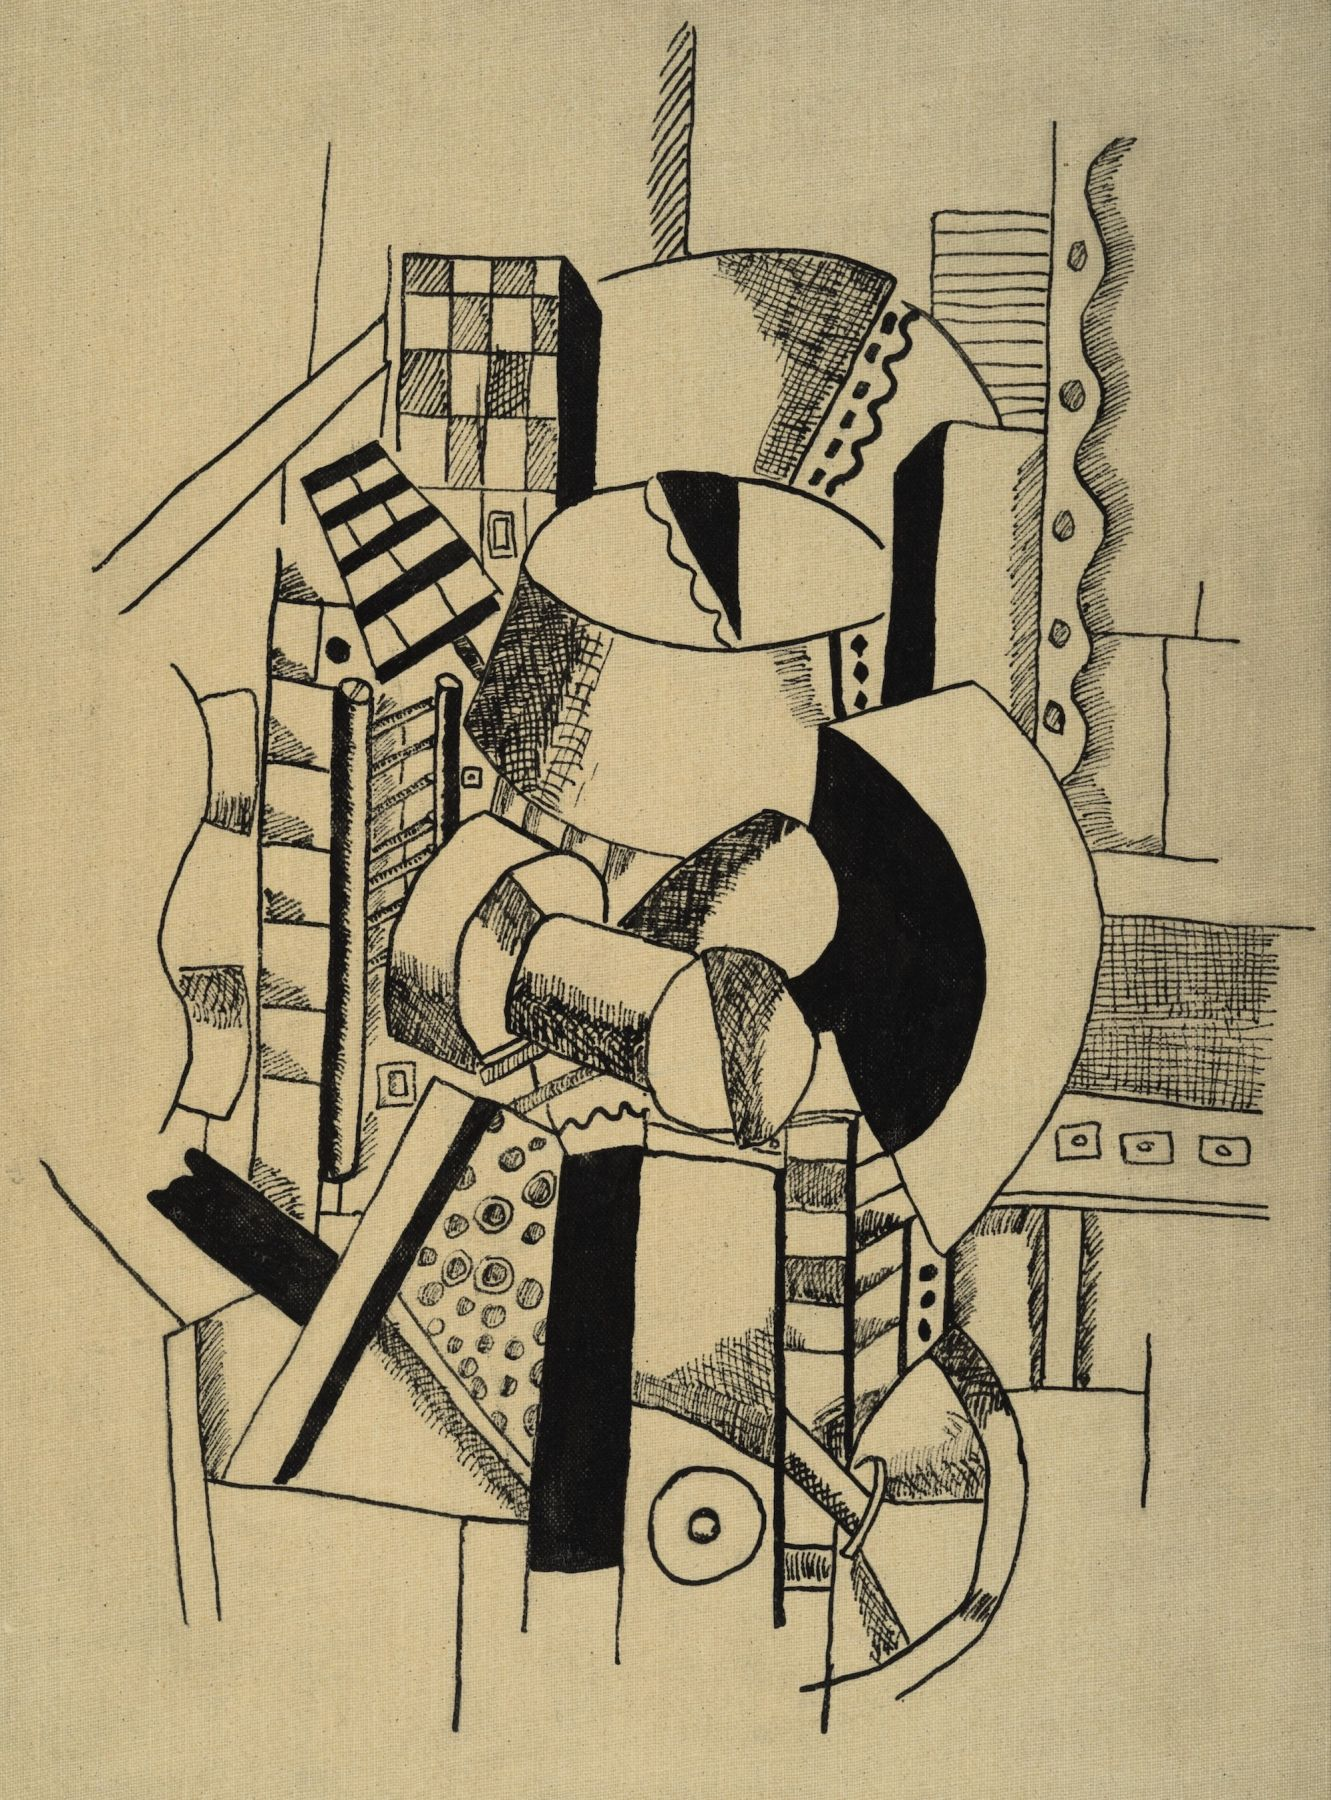 Fernand Léger, Composition aux eléments mécaniques, 1917-18 India ink on linen laid down on board 25.7 x 18.8 cm. (10 1/8 x 7 3/8 in.)